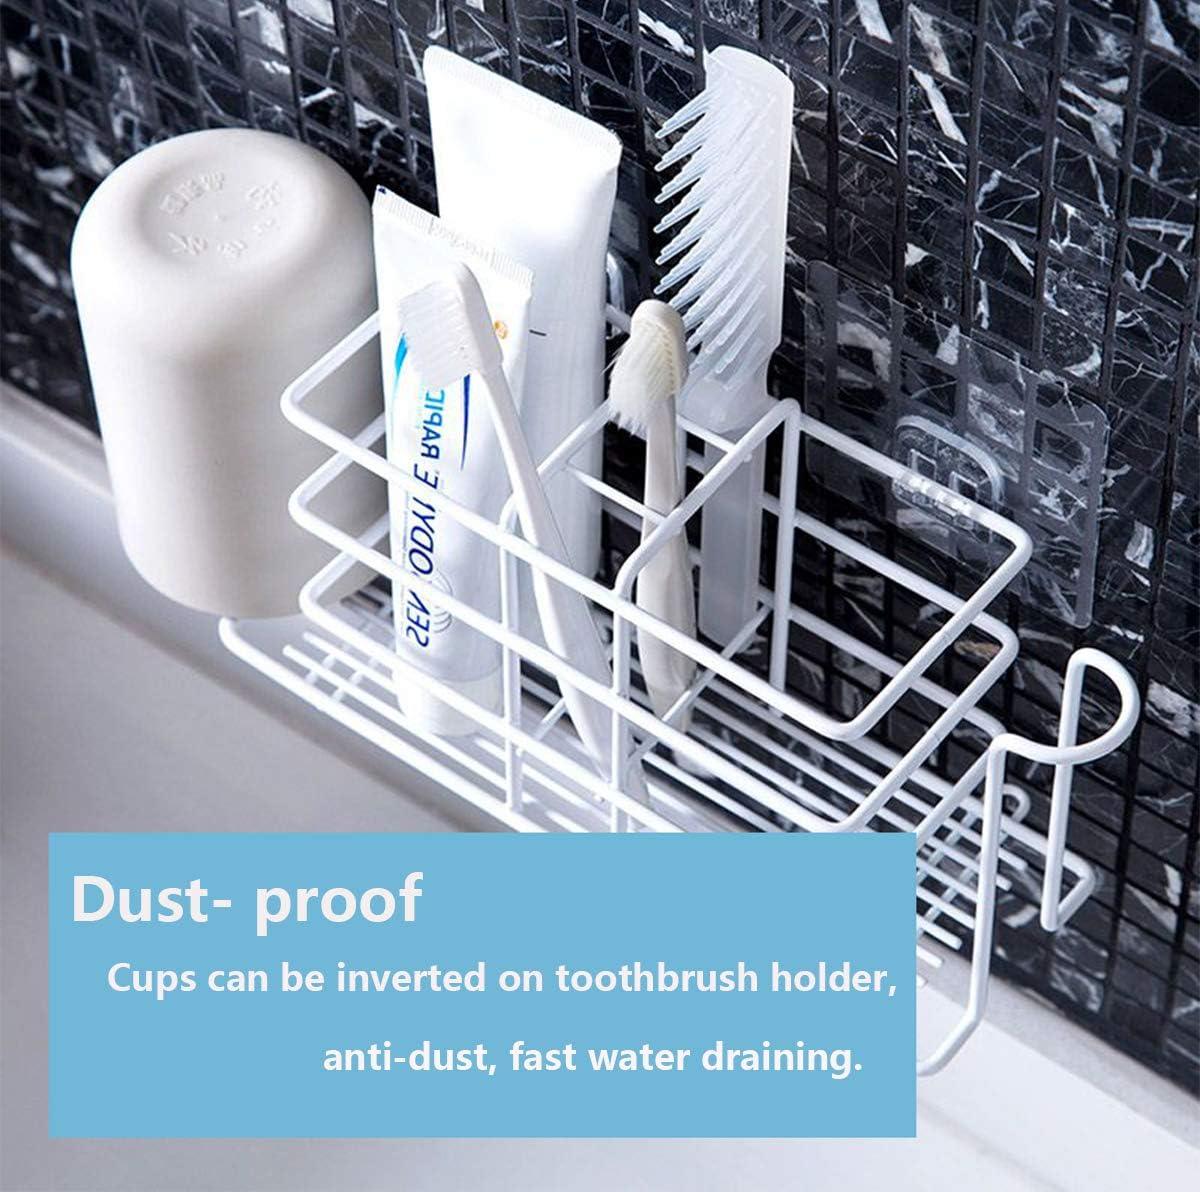 Bamyko Toothbrush Holder Toothpaste Holder Wall Mounted Stainless Steel Bathroom Storage Organizer White